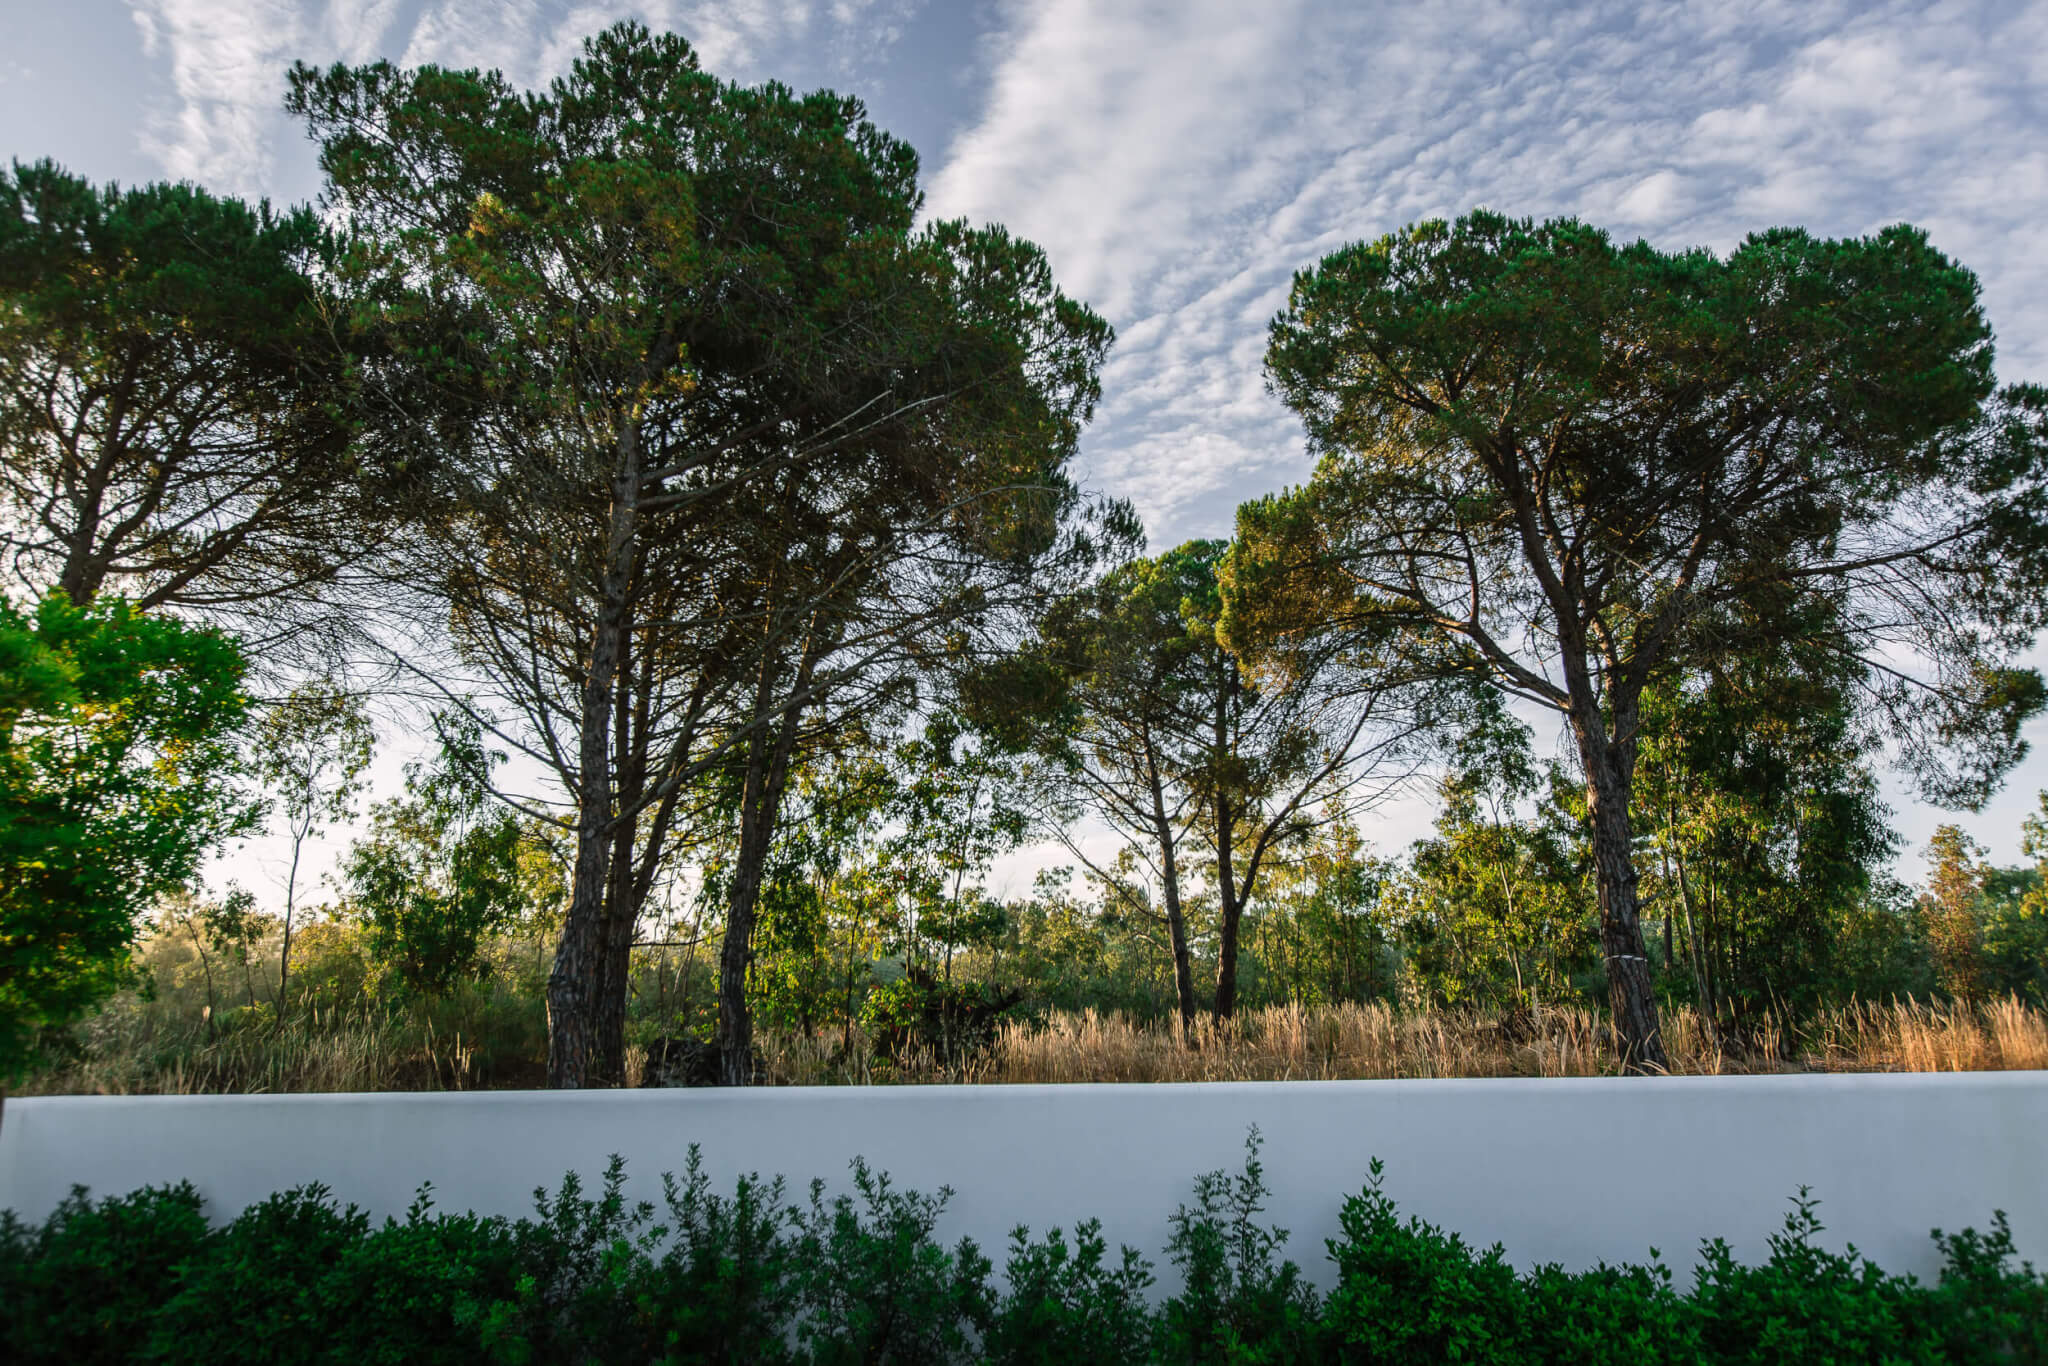 Brejos Villa Comporta trees